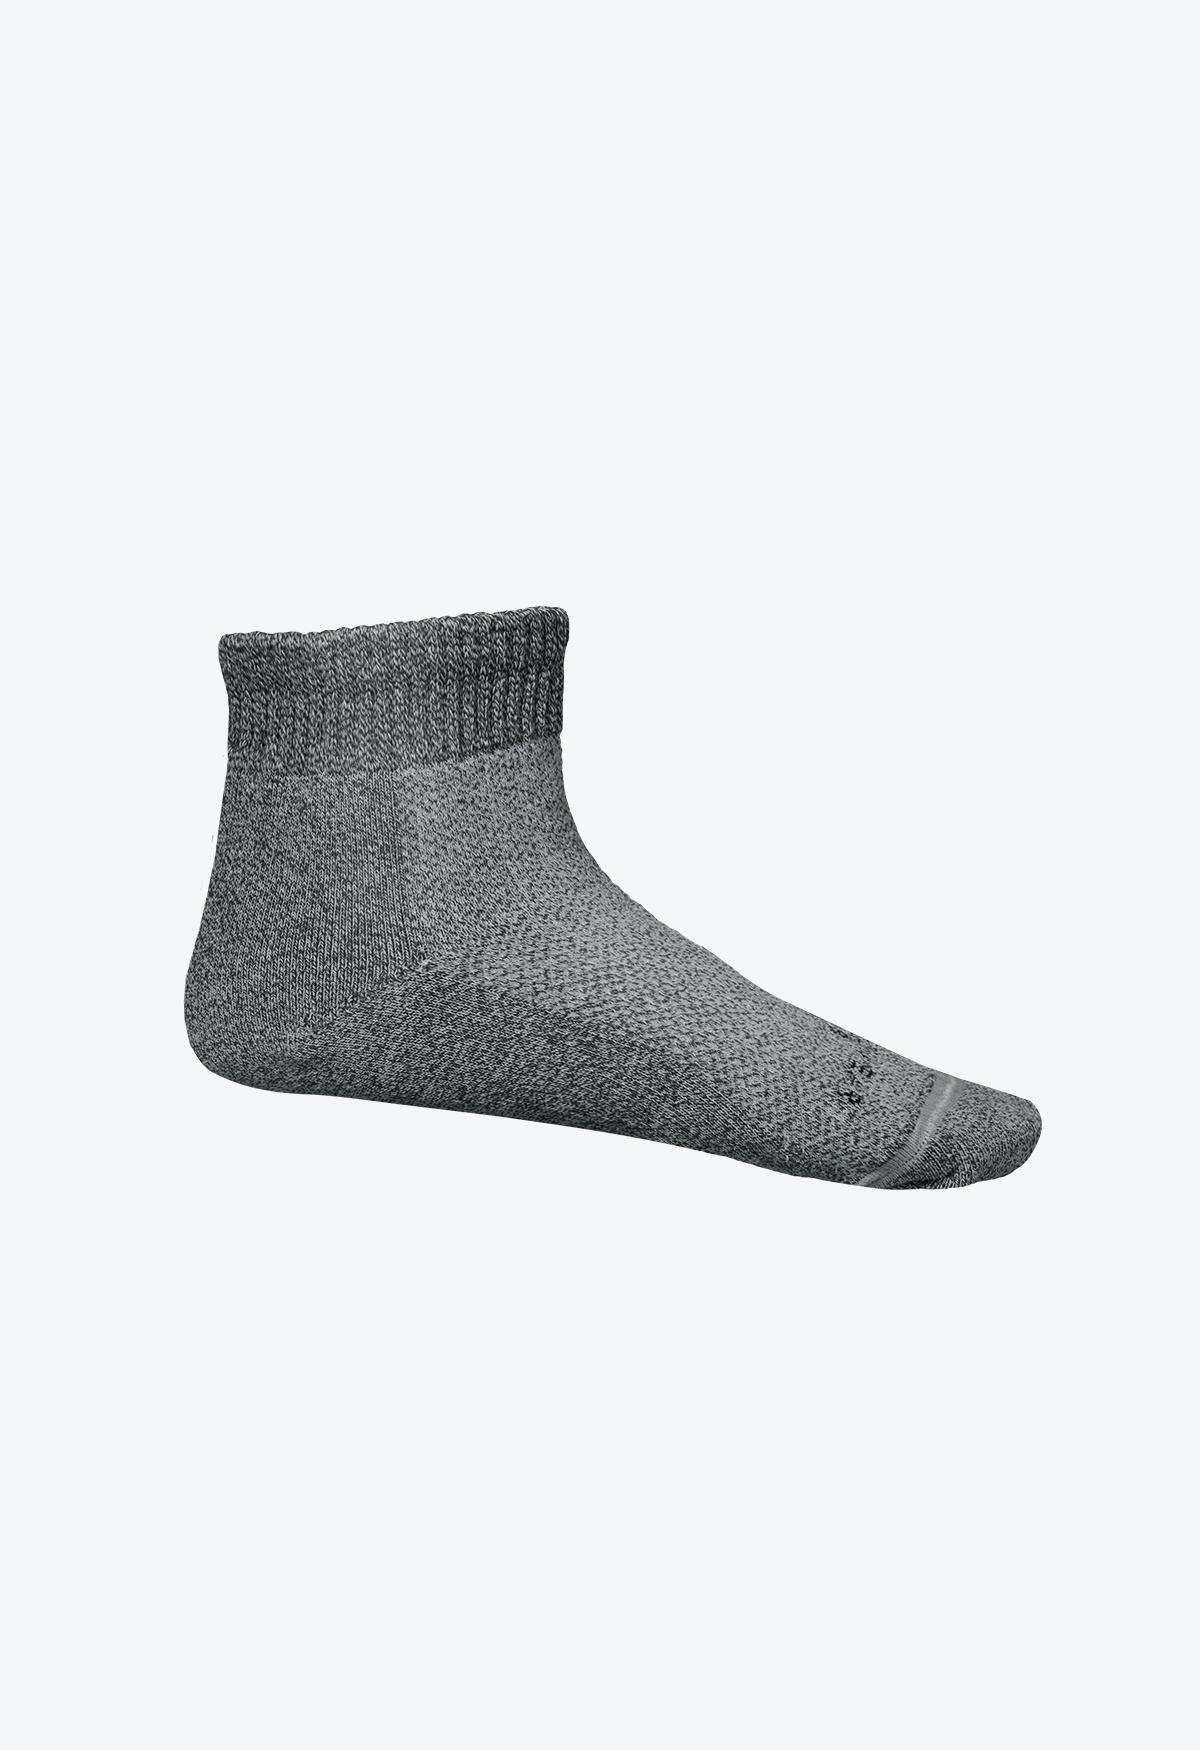 Circulation_Socks_Grey_Ankle_Side